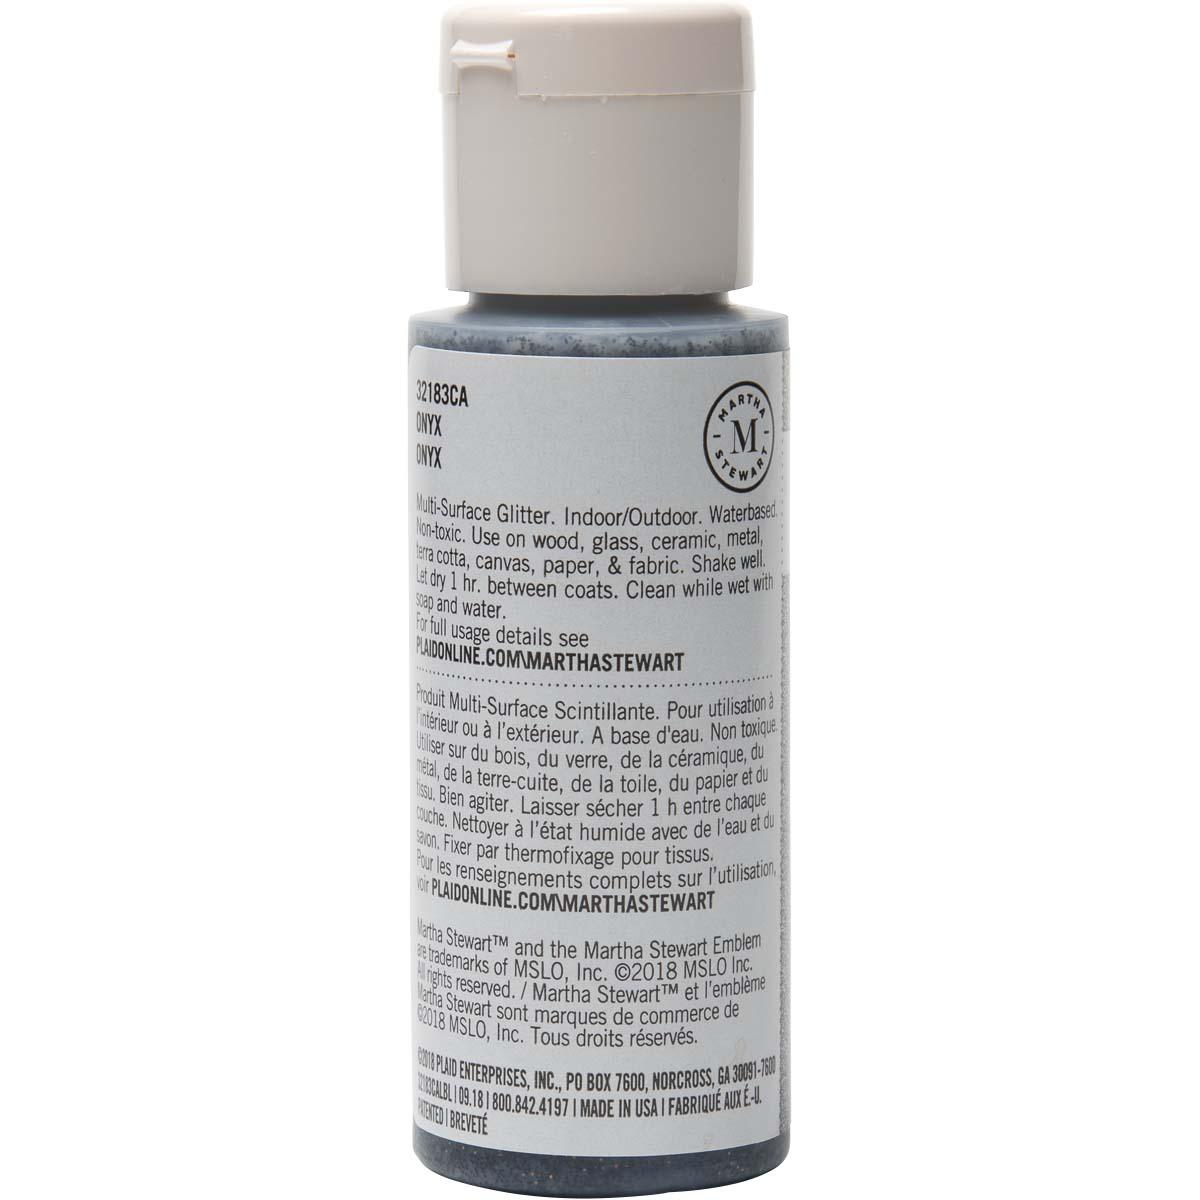 Martha Stewart ® Multi-Surface Glitter Acrylic Craft Paint - Onyz, 2 oz. - 32183CA